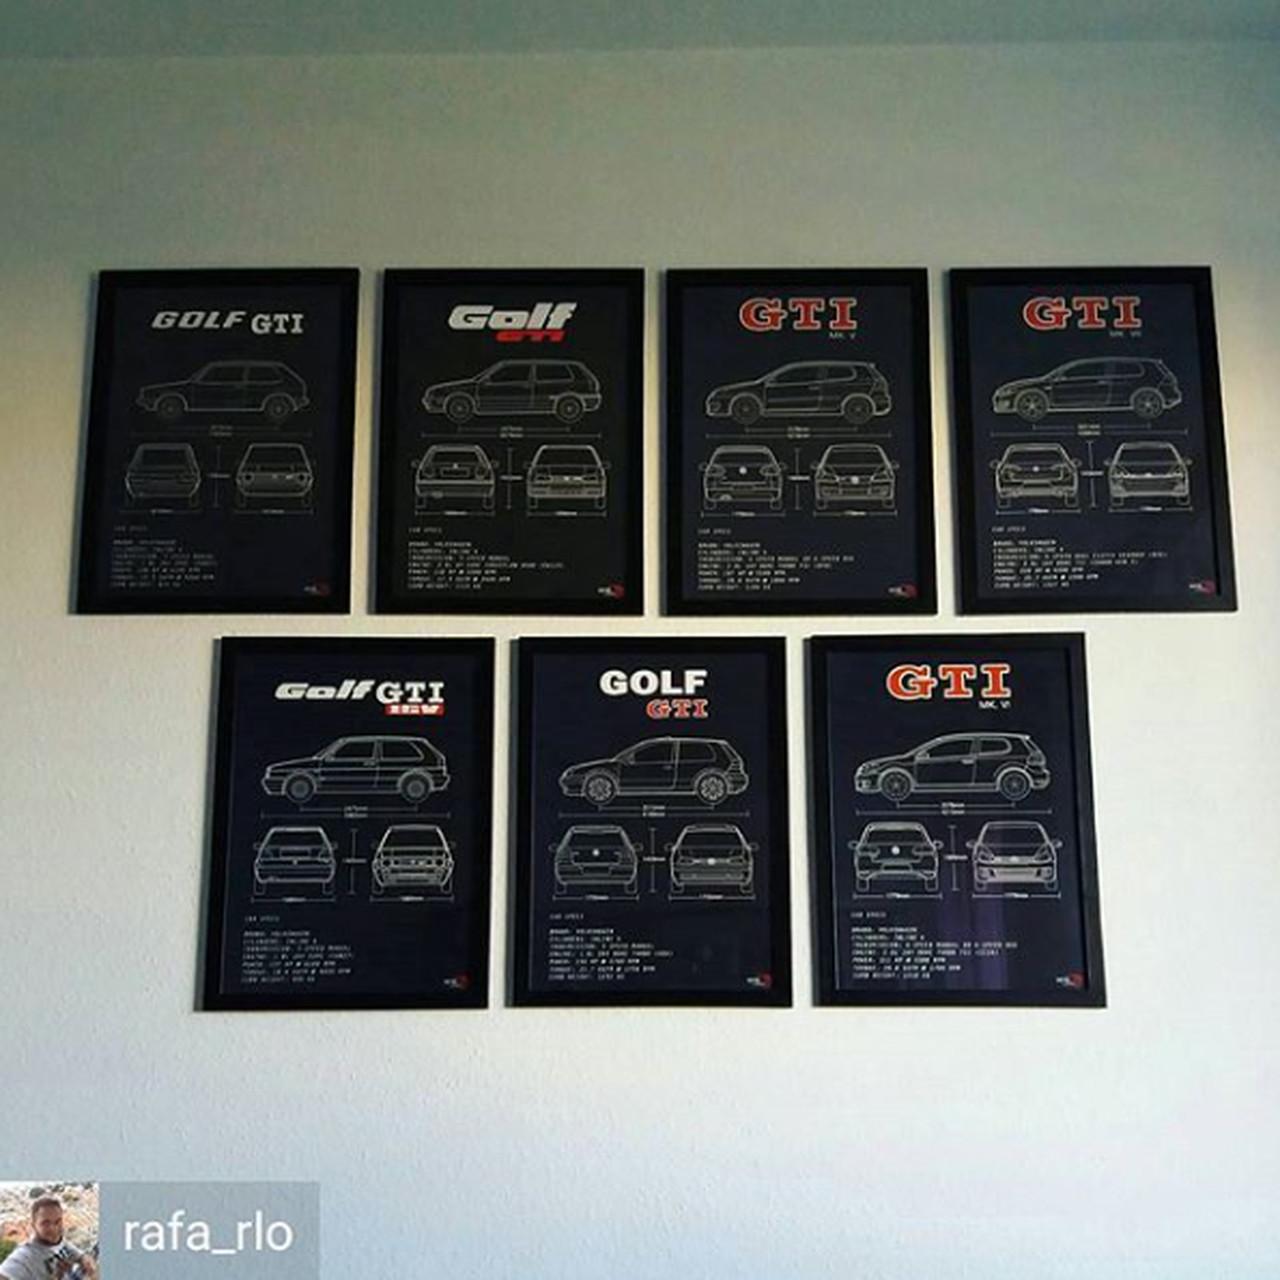 QUADRO/POSTER VOLKSWAGEN GOLF GTI MK3